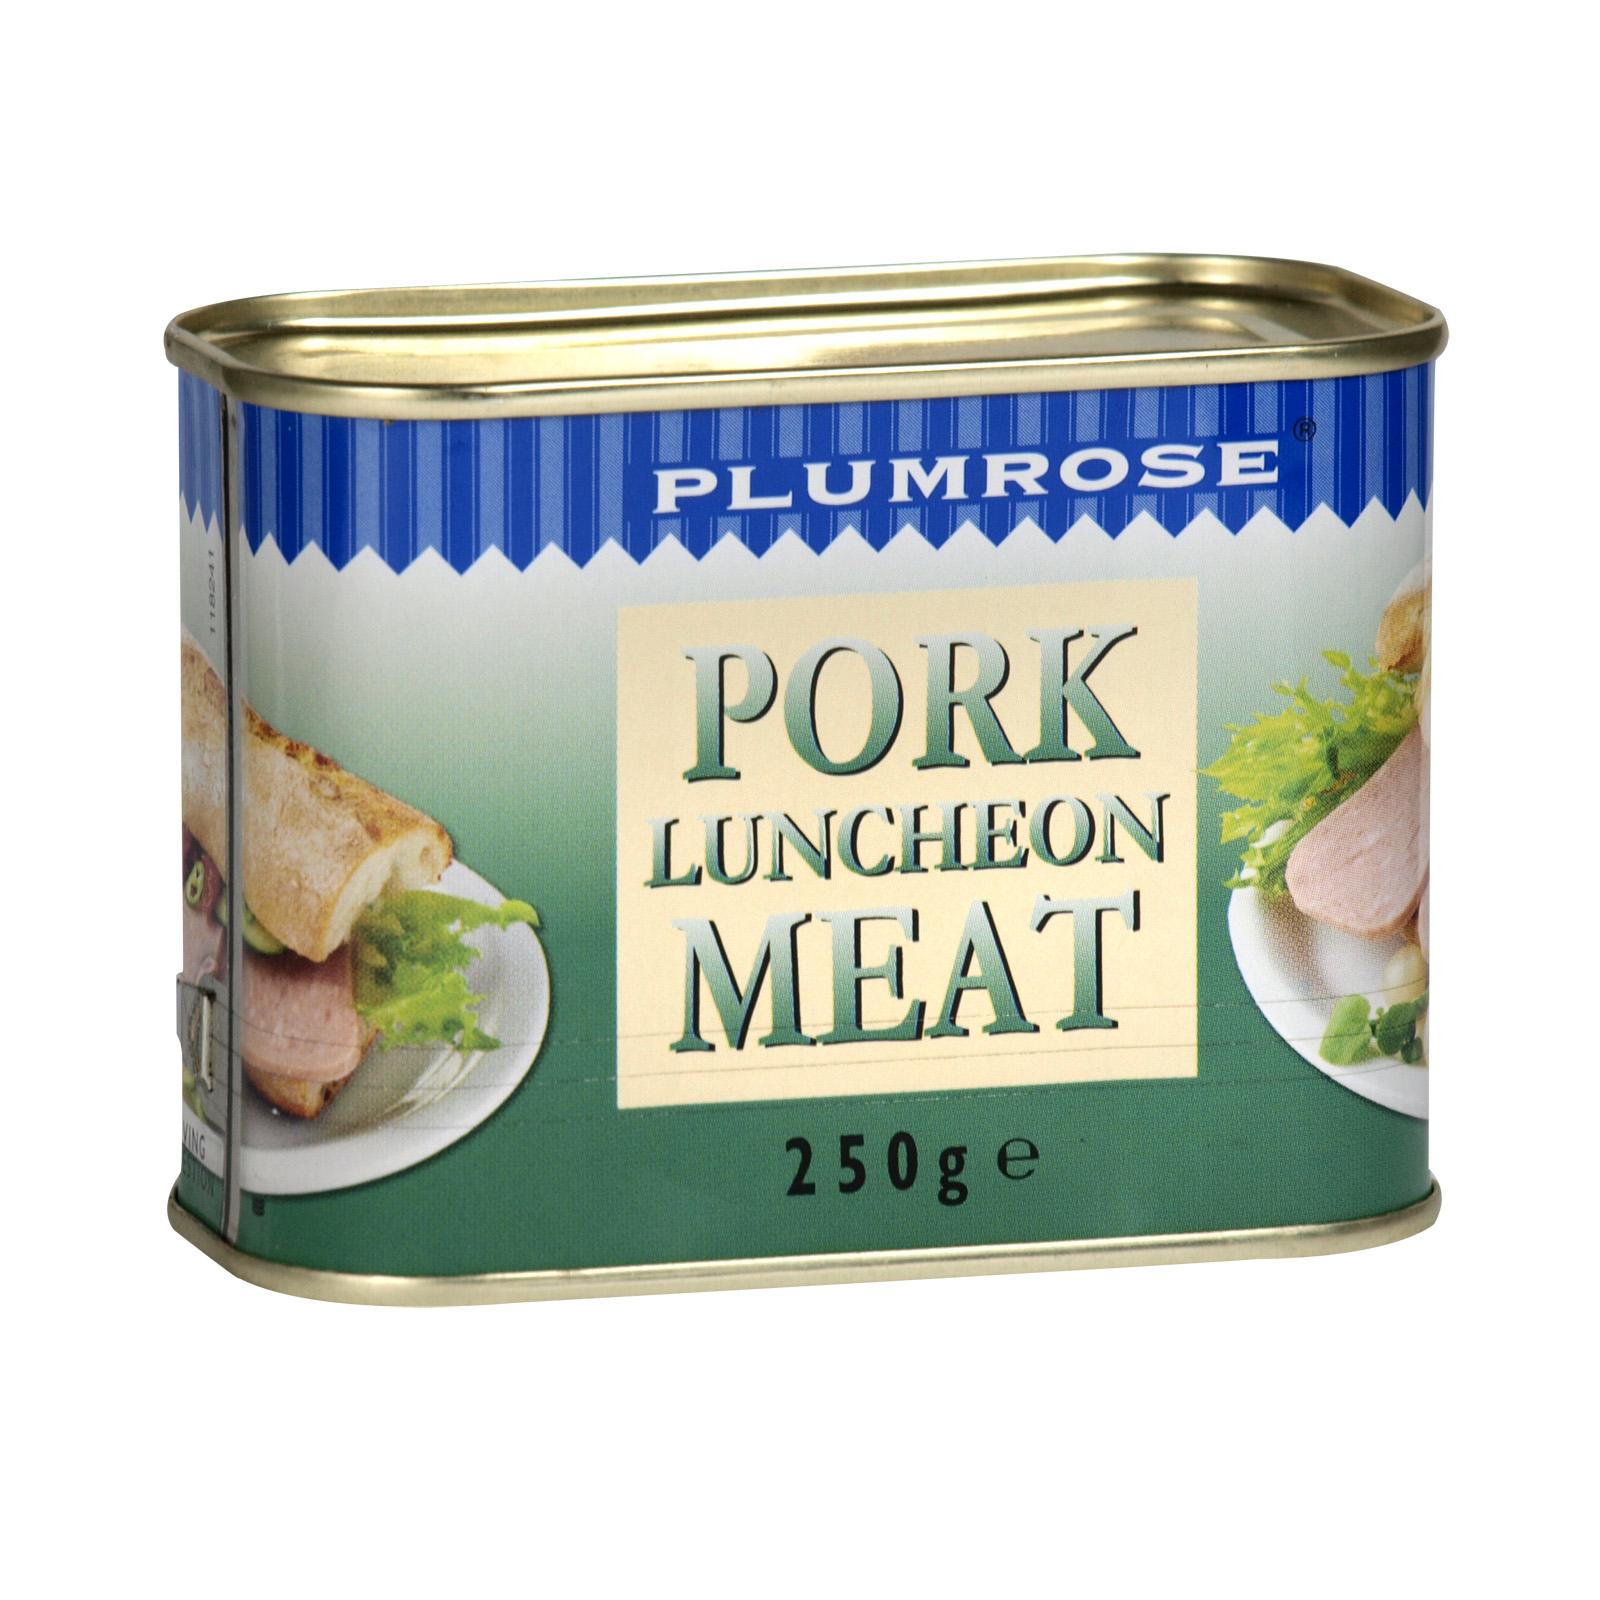 PLUMROSE PORK LUNCHEON MEAT 250GM X12